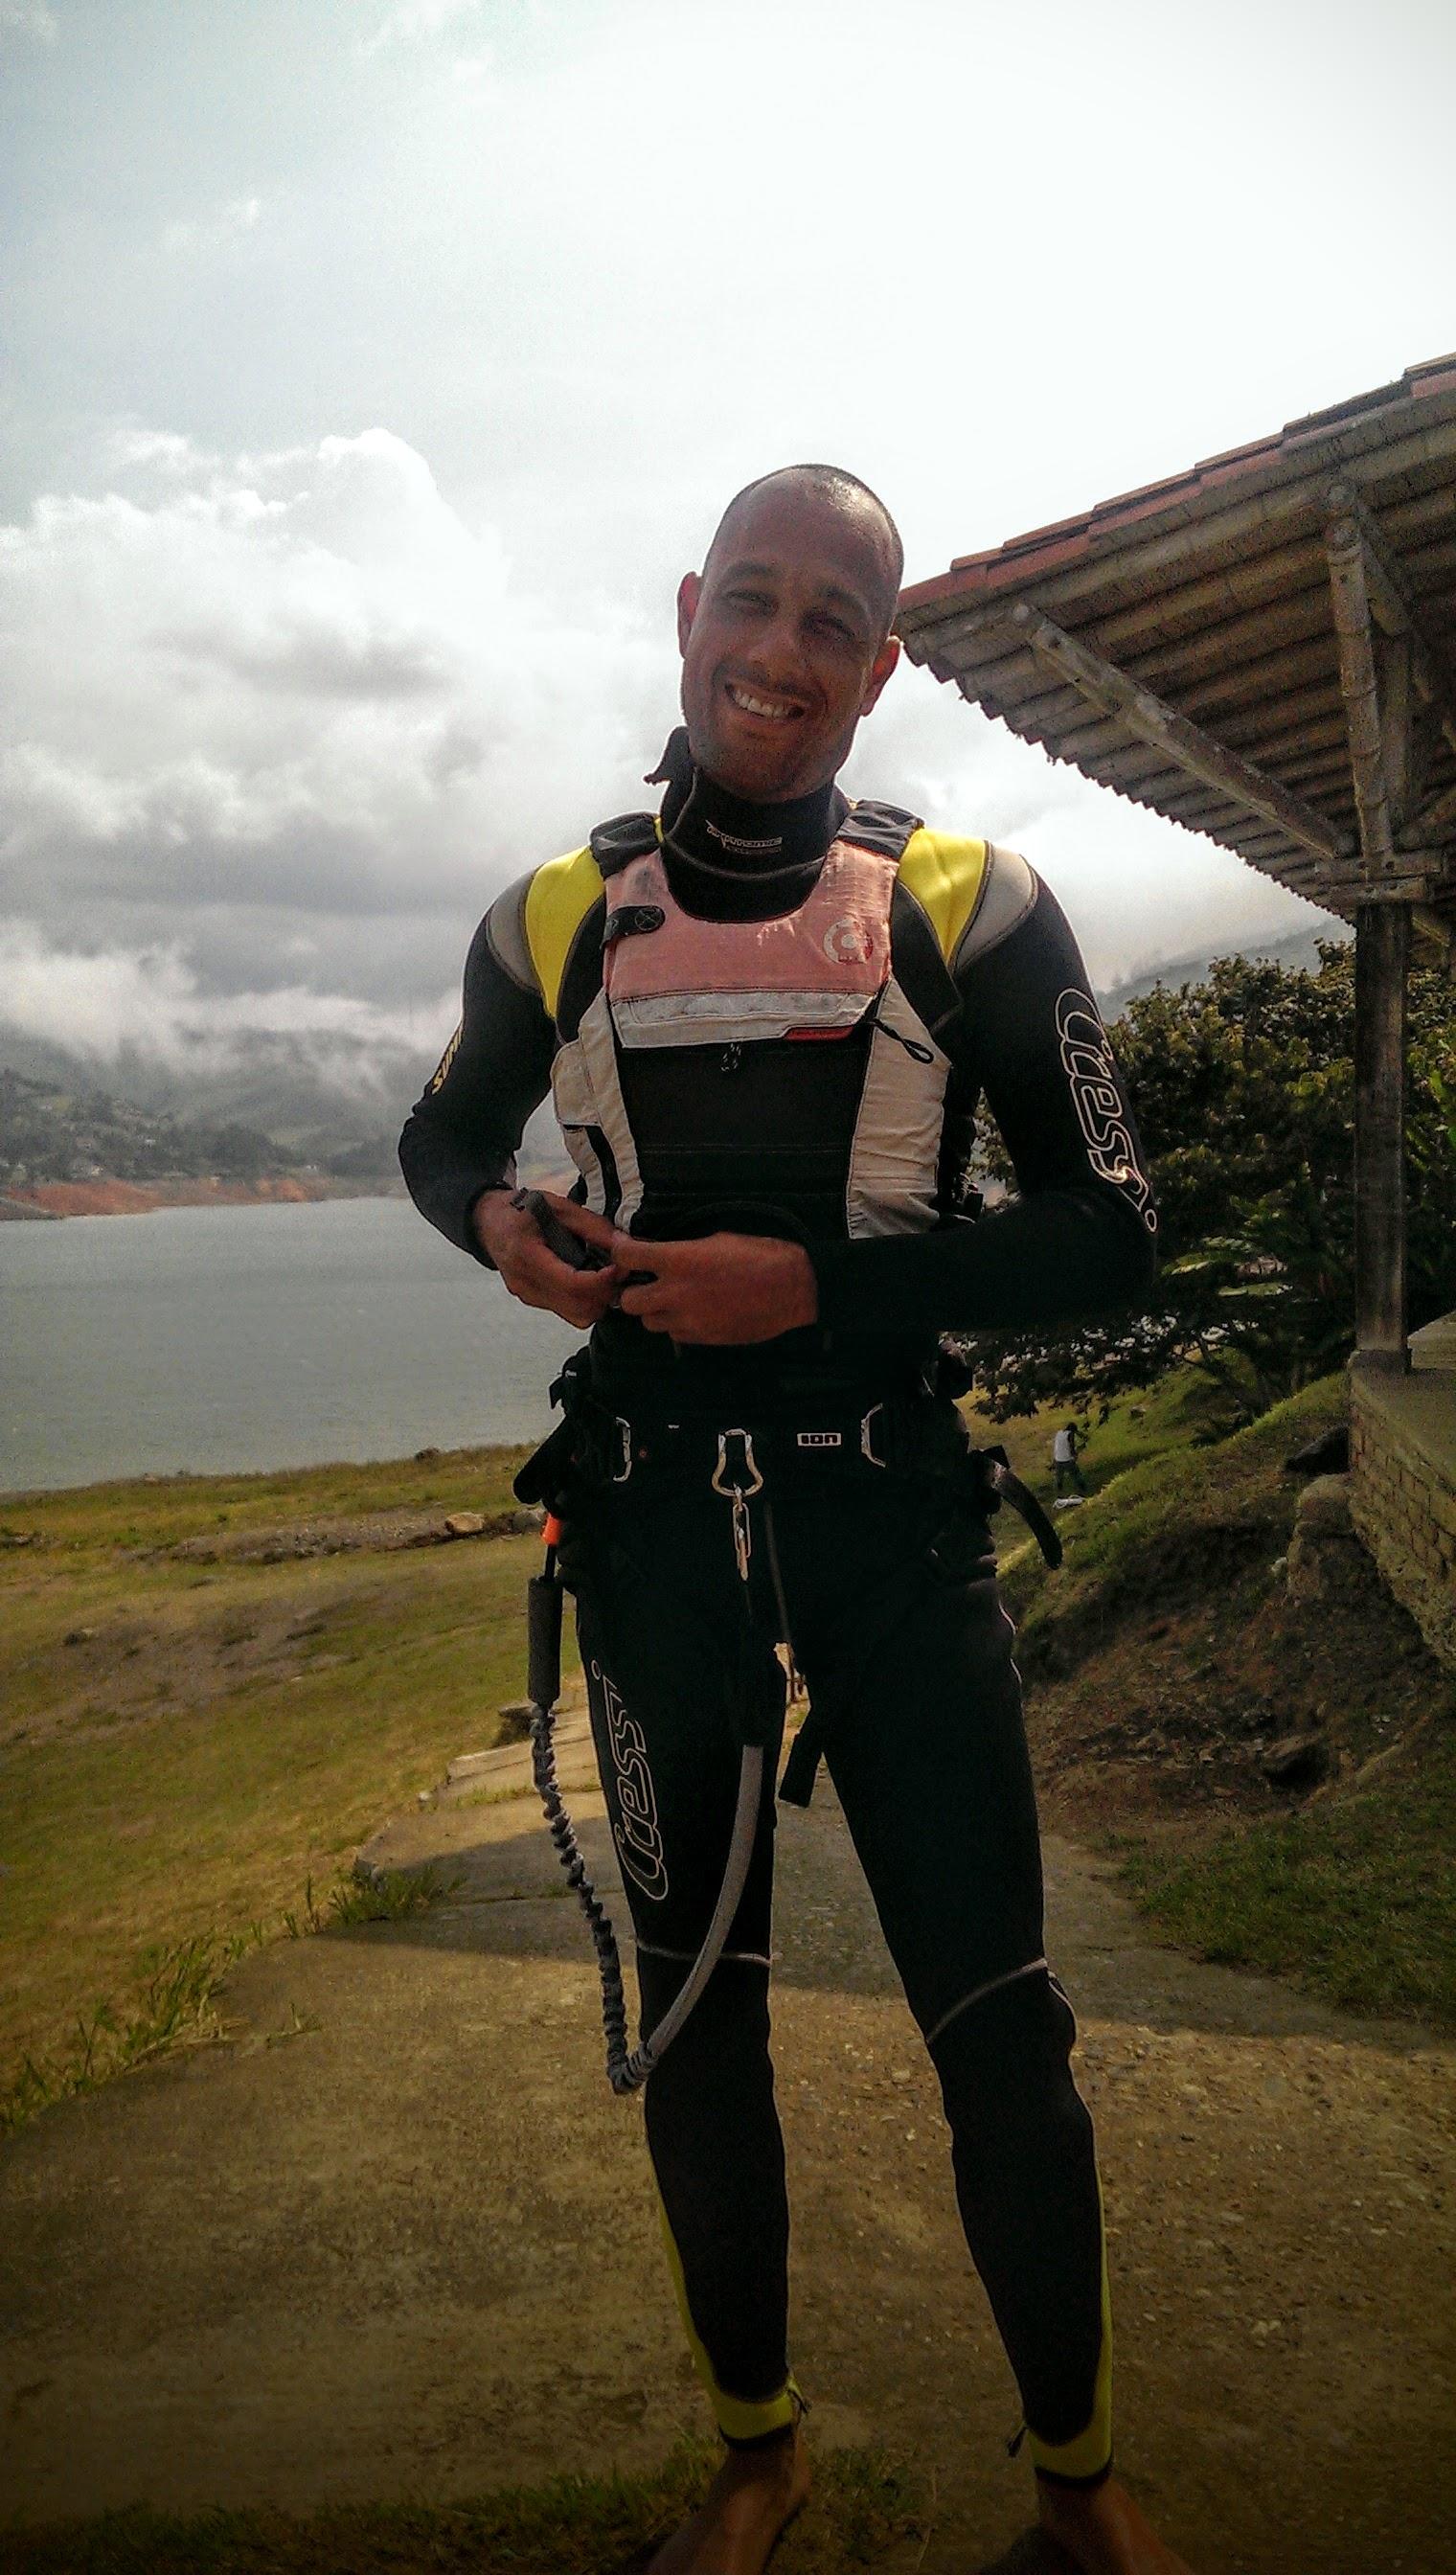 kitesurfing in lago calima